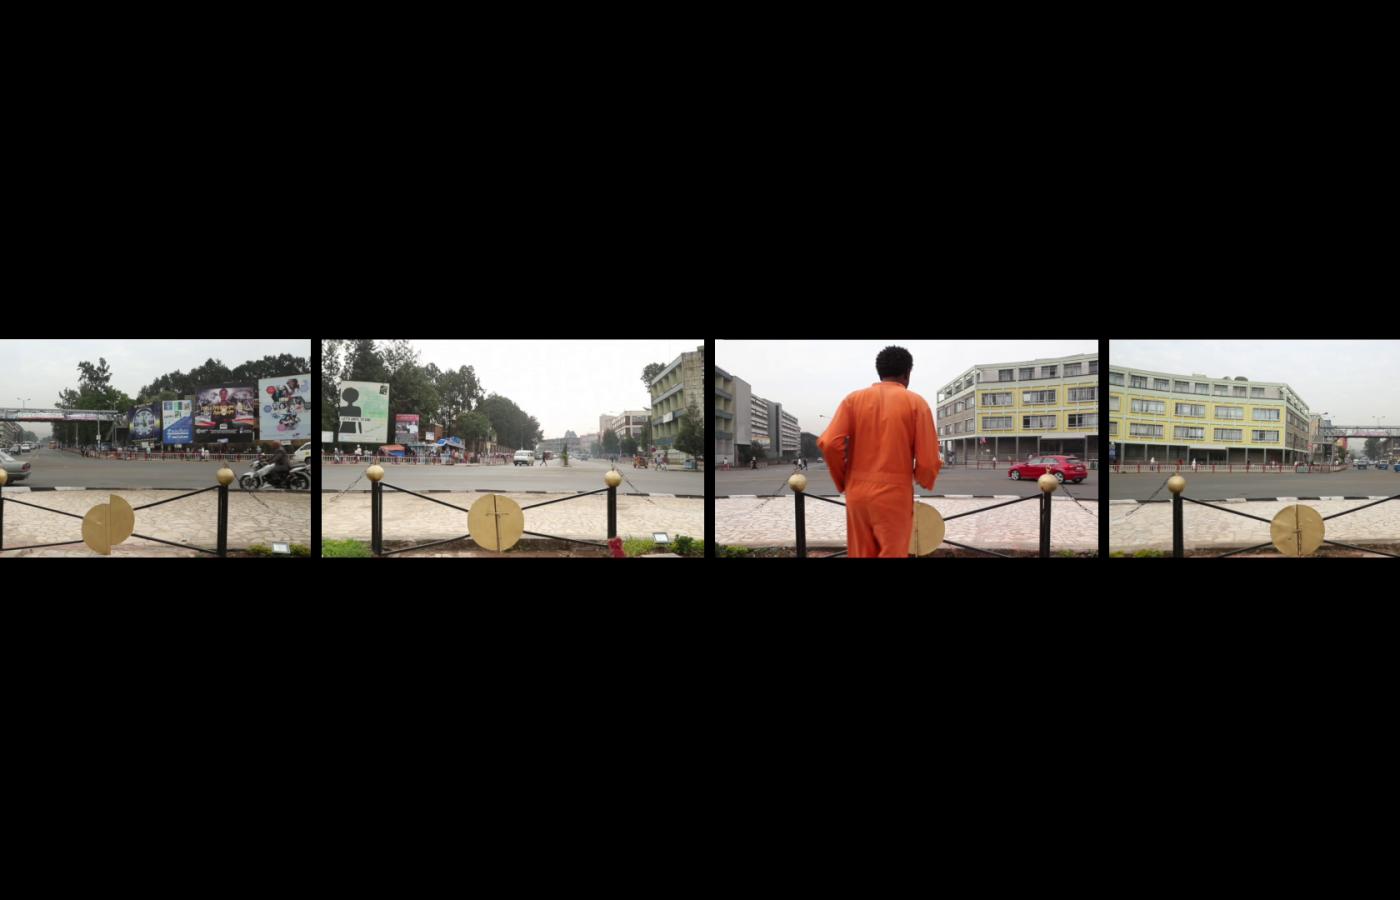 Naod Lemma, 360 Birtukanoch/ 360 Oranges, 14:57, 2015